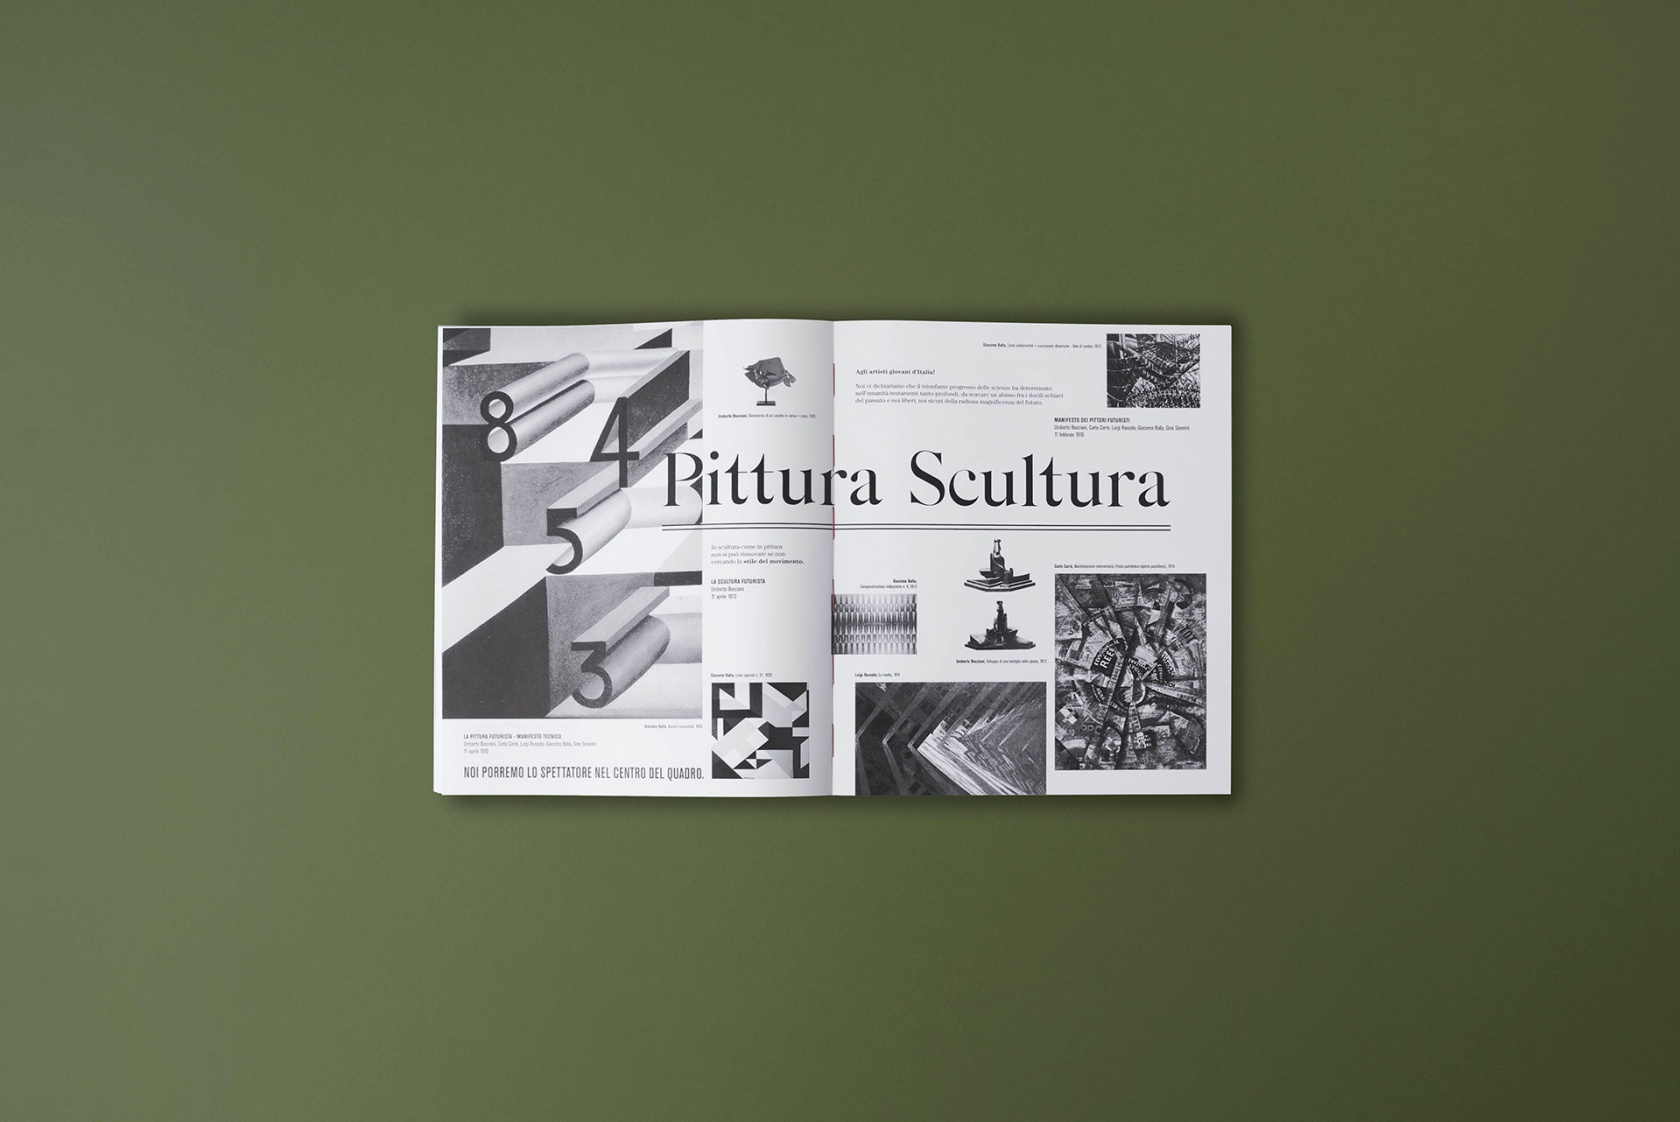 agenda futurista pittura scultura lr 1680x1122 q95